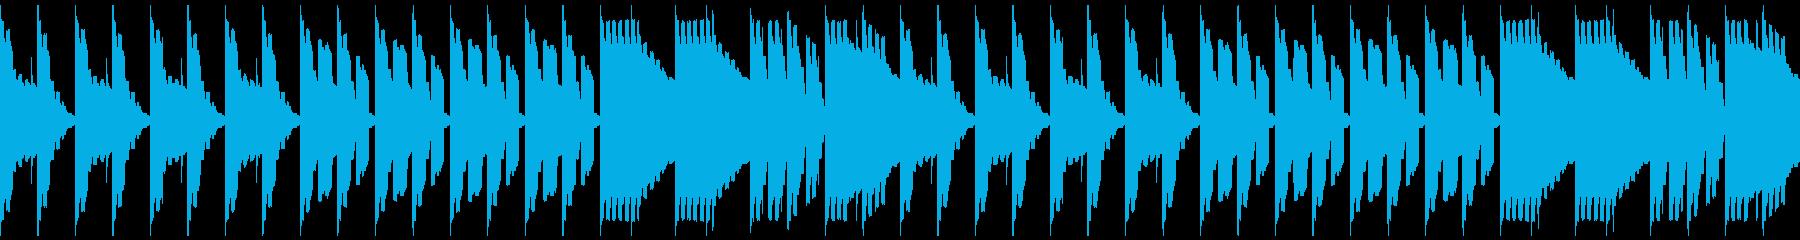 FC風ループ 菌糸舞う洞窟の再生済みの波形